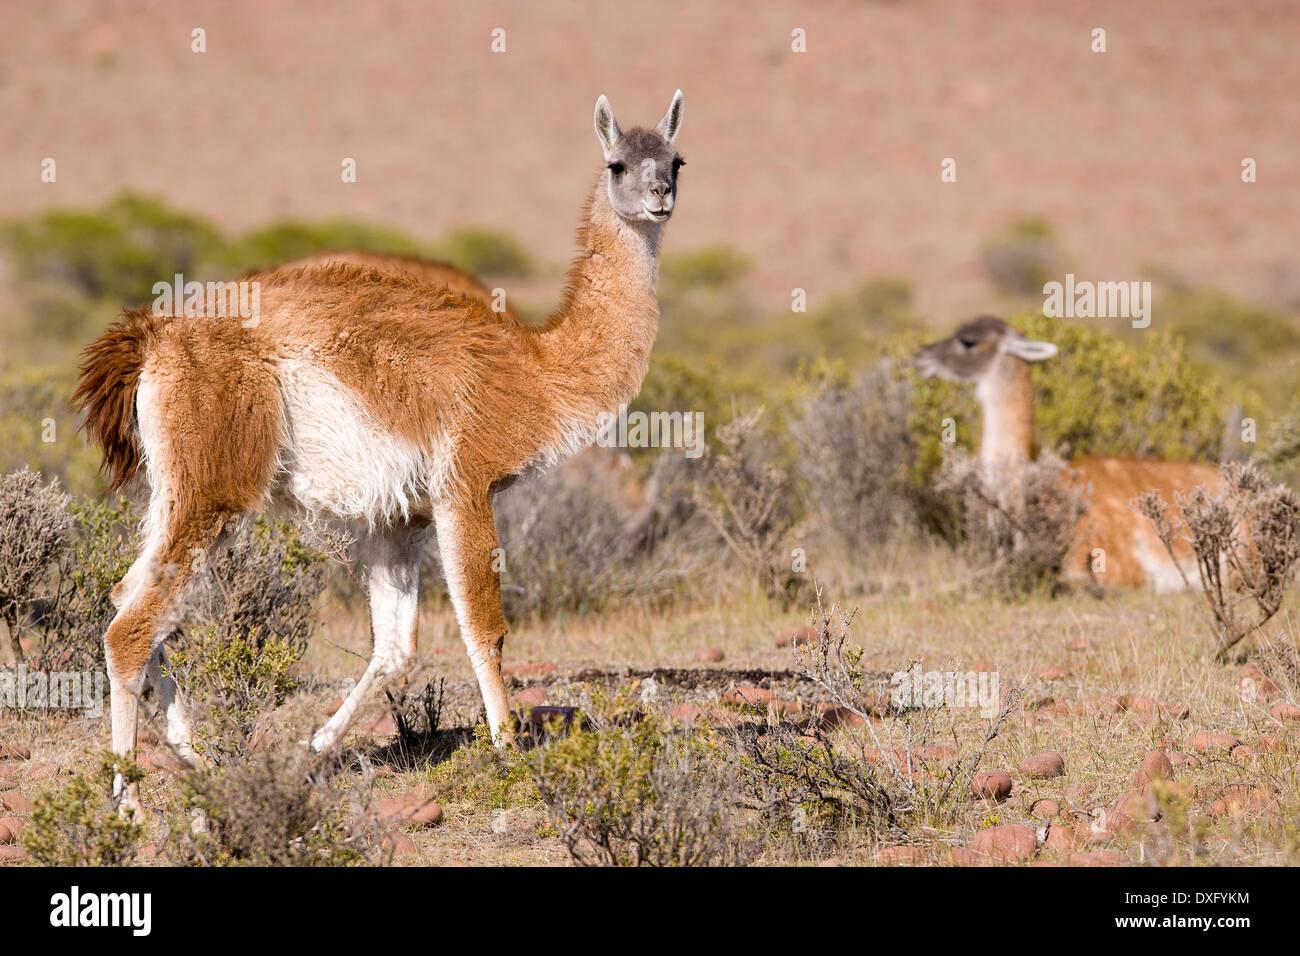 Guanaco Lama, Lama Guanicoe, Valdes Peninsula, Patagonia, Argentina - Stock Image